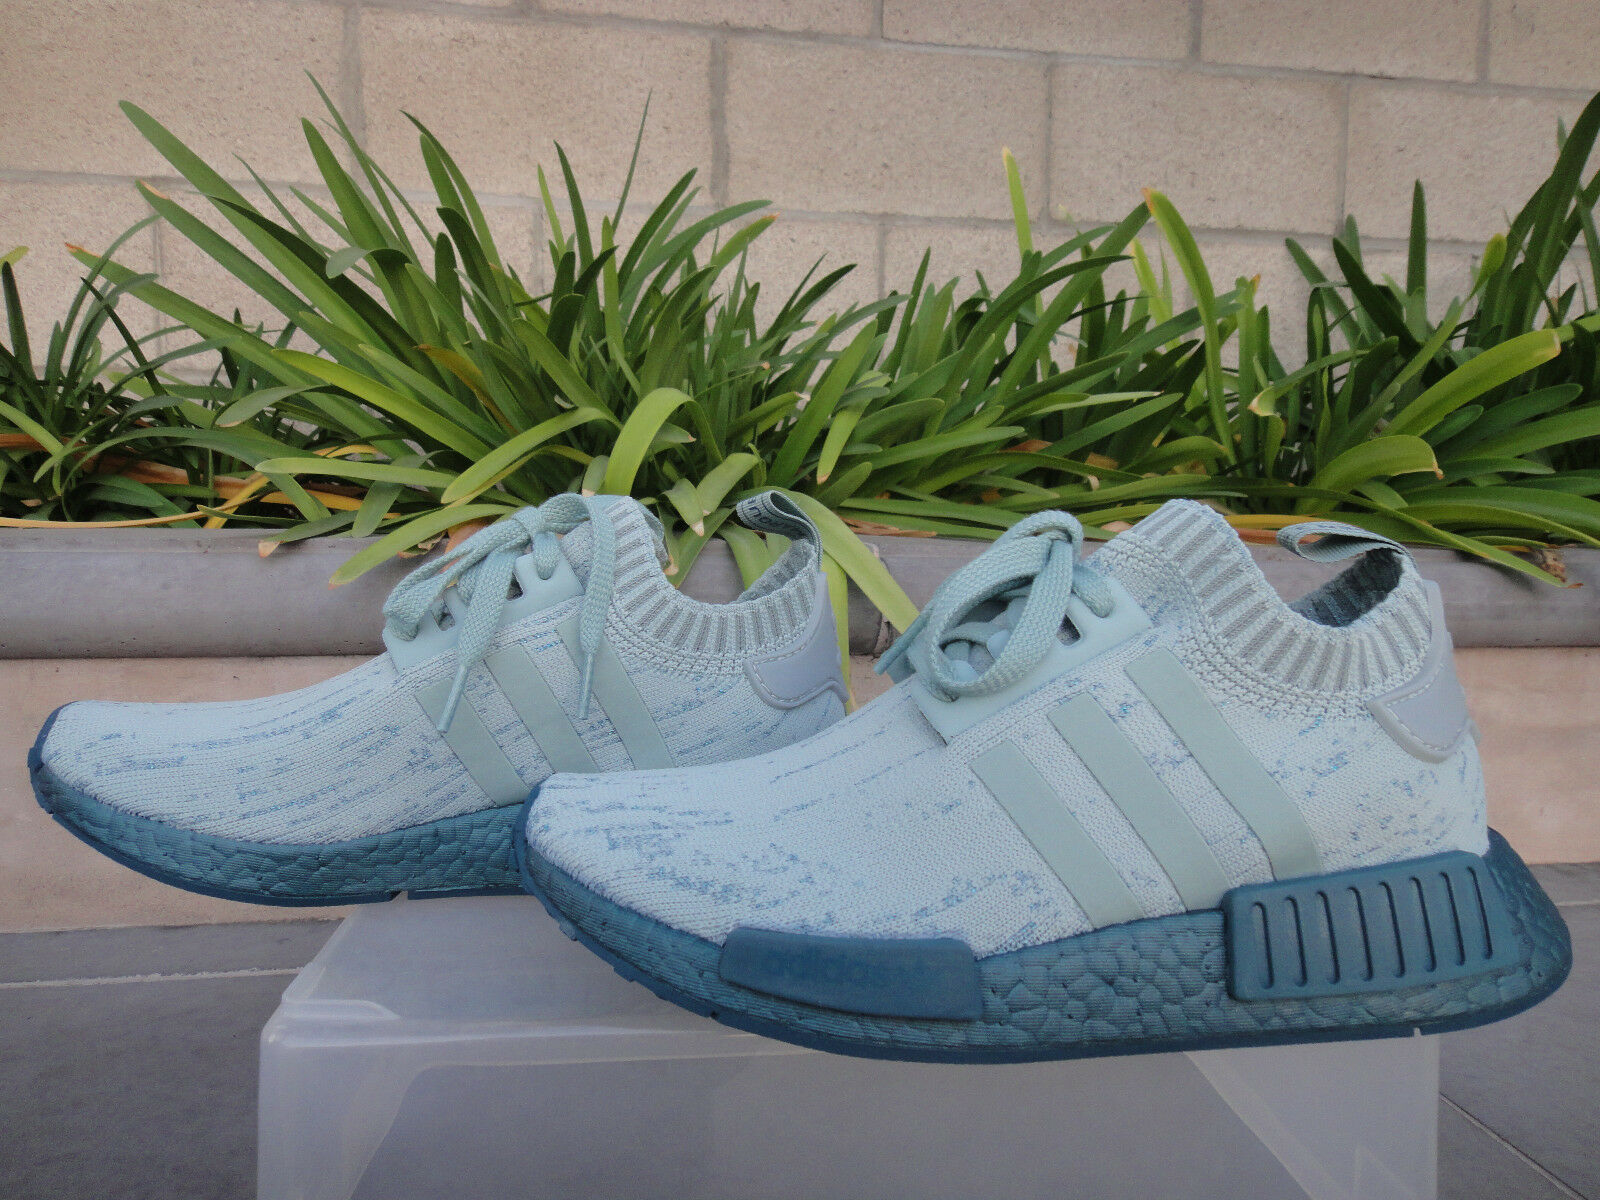 Adidas originali impulso nmd verde, r1 w primeknit al verde, nmd cg3601, wmn sz 7 (desc) cc544a